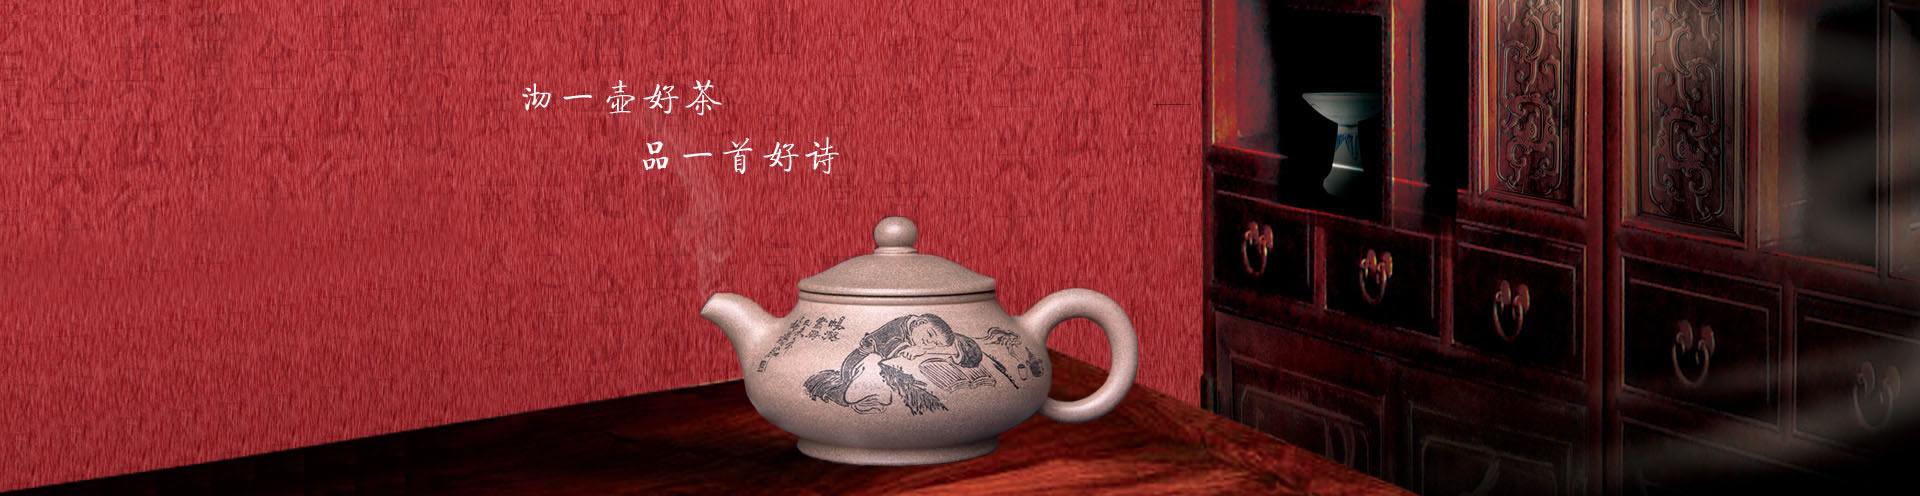 http://www.juhutang.com/shop.php